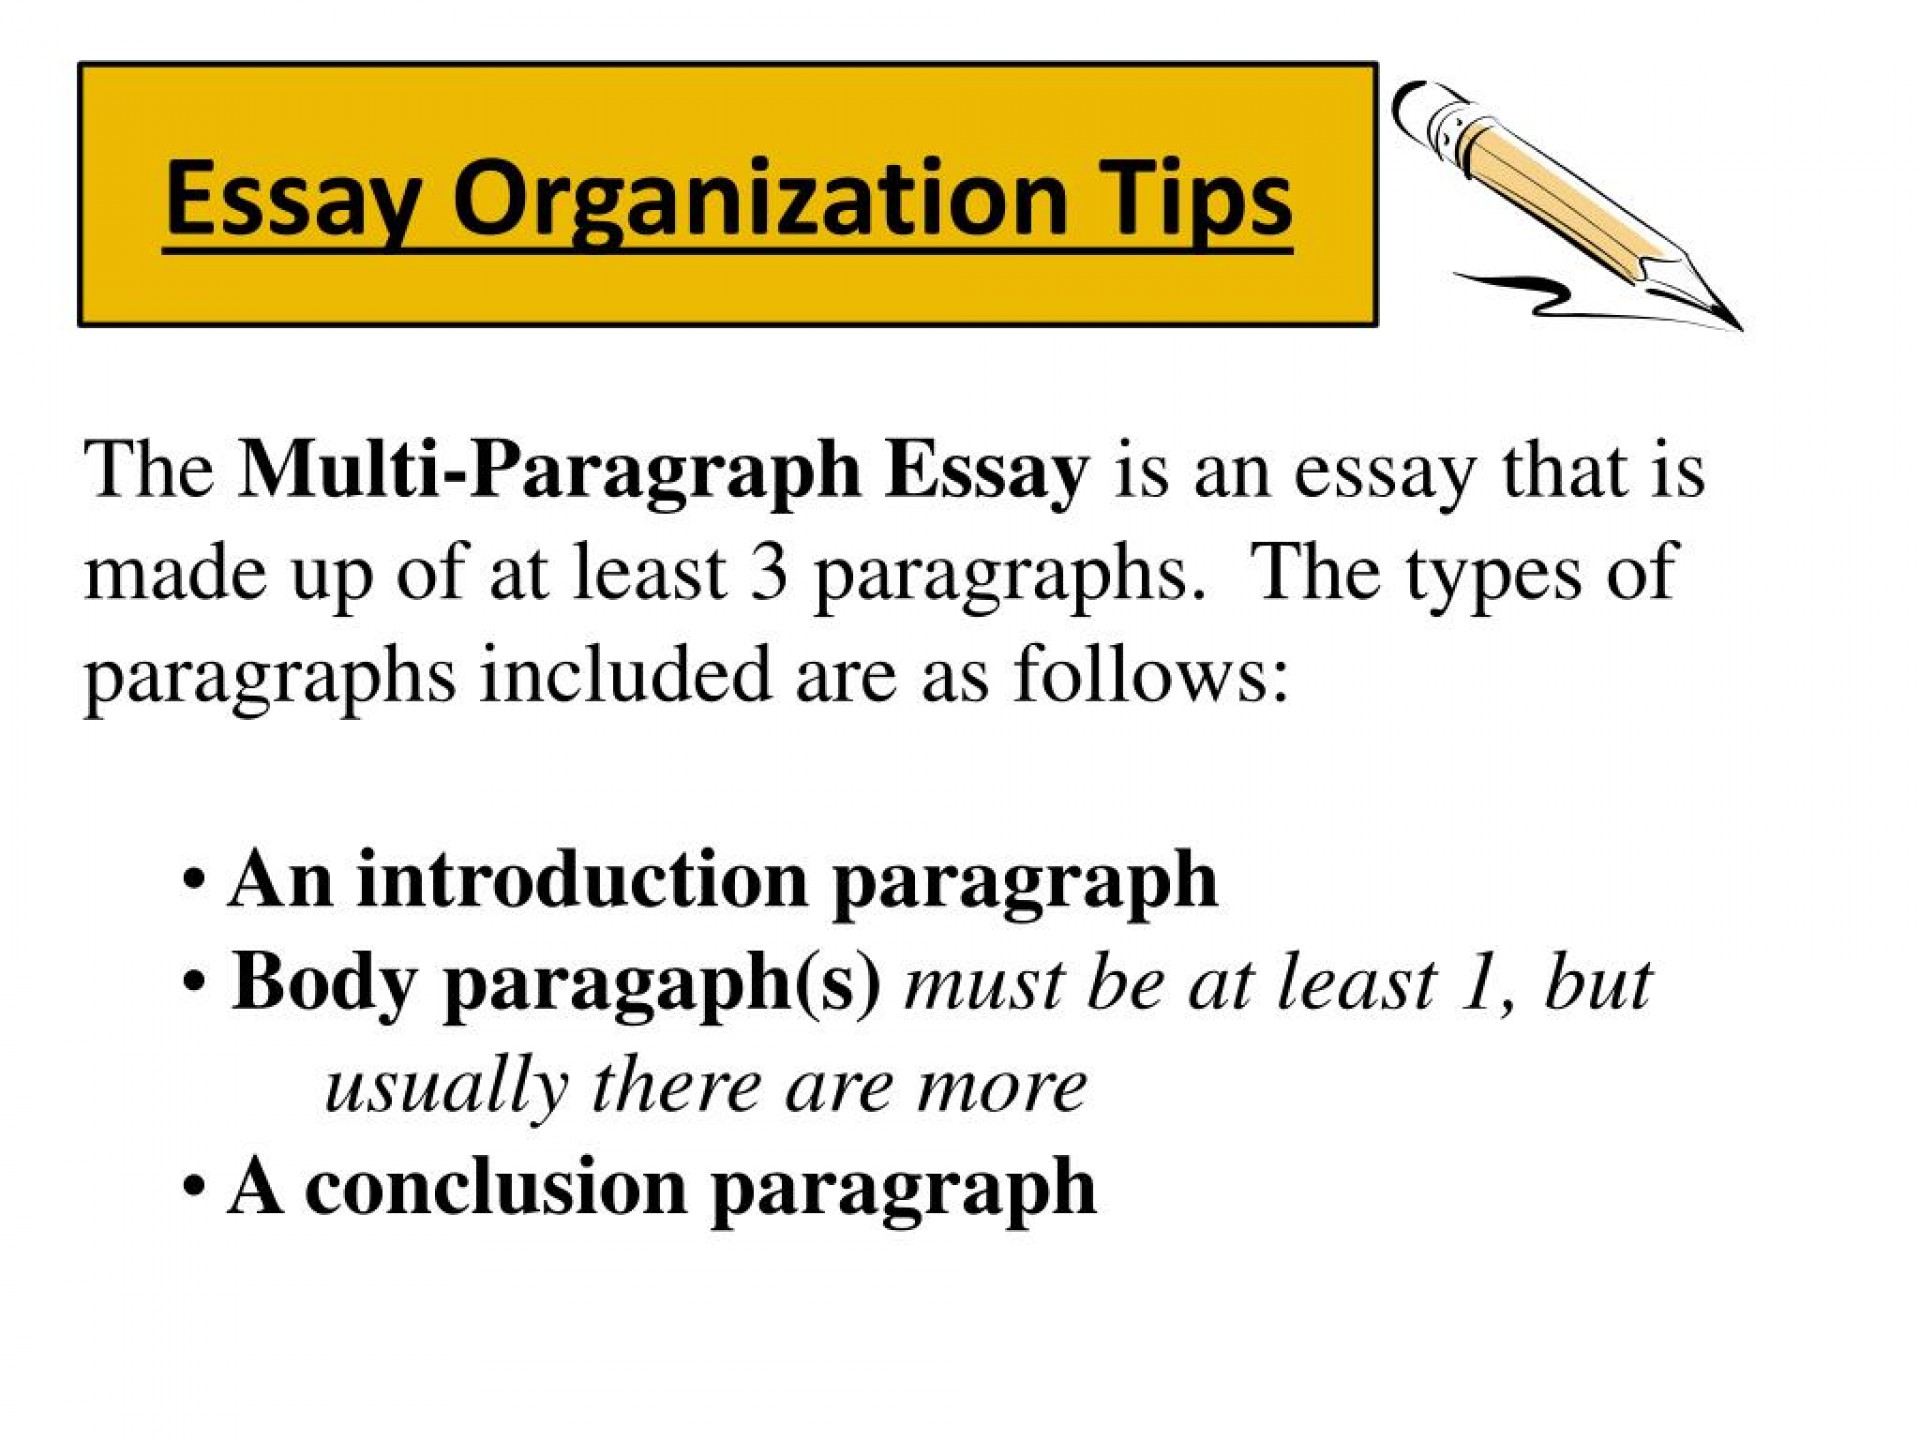 001 Organization Of Essay Example Tips Fascinating Expository Persuasive Methods For Argumentative Essays 1920